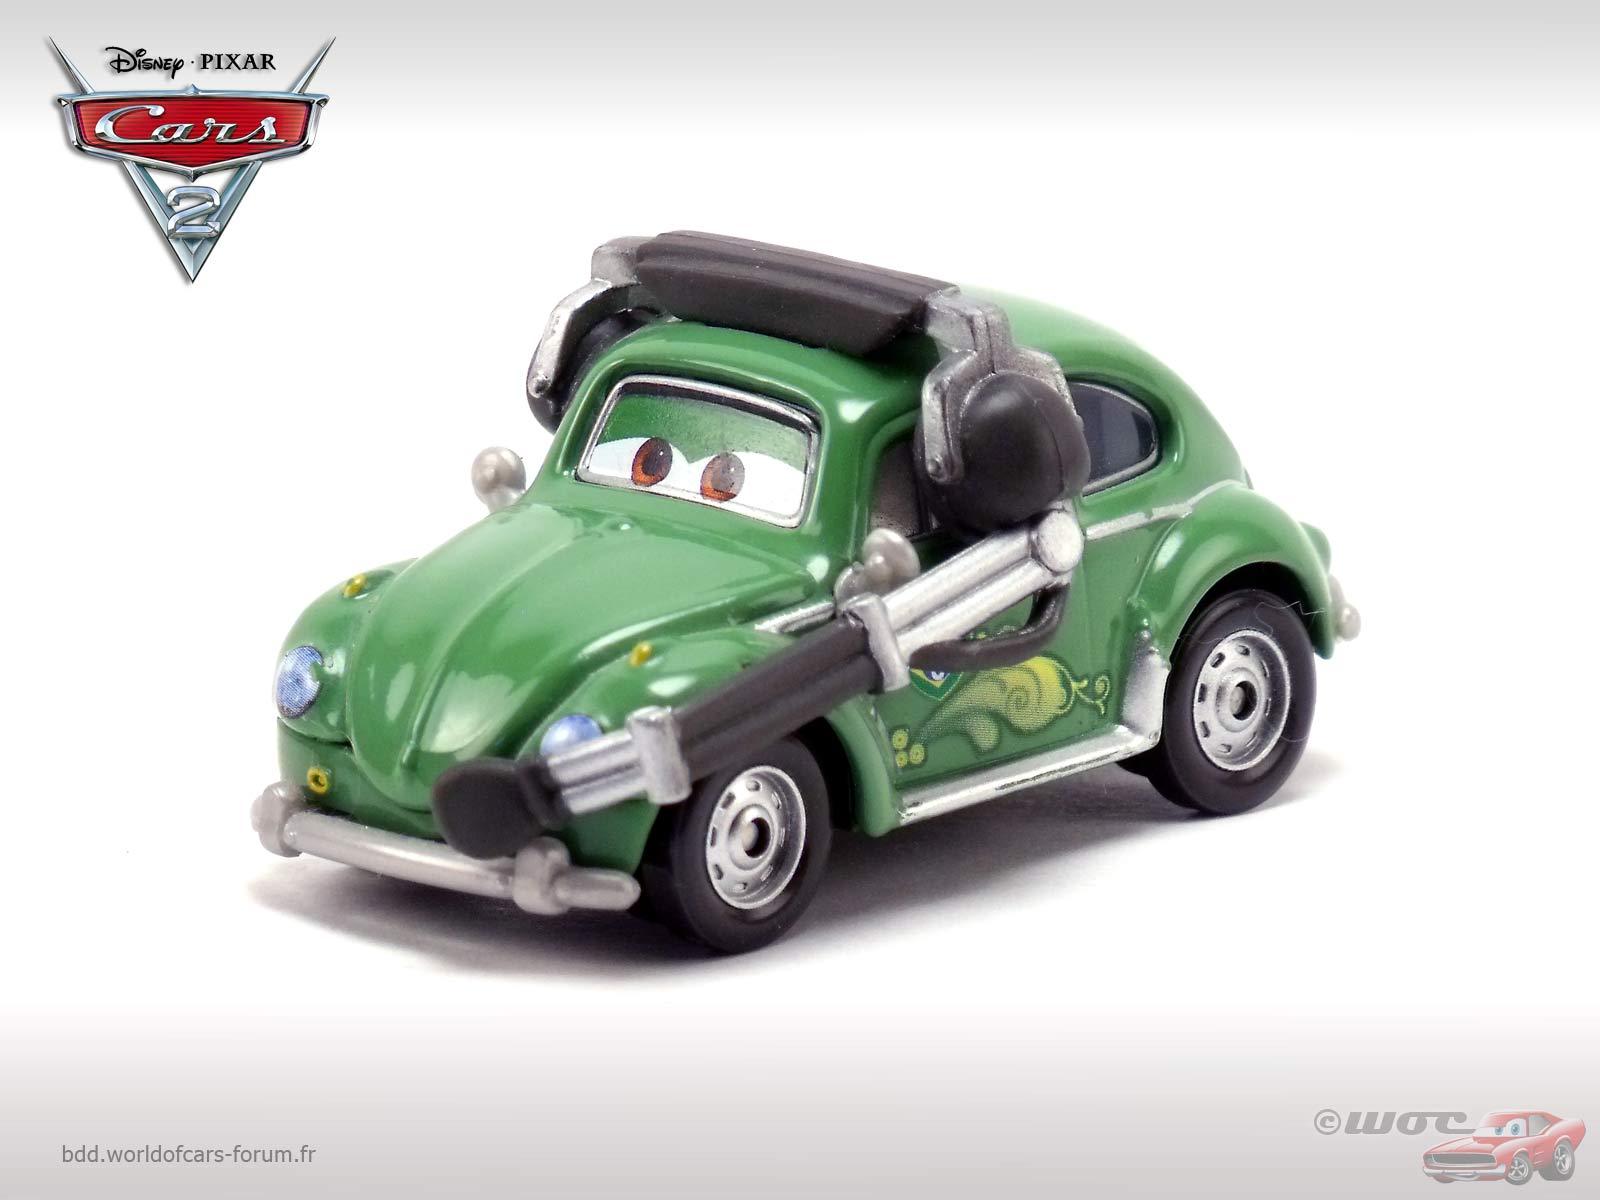 [Cars 2] Récapitulatif des personnages - Page 2 Cruz_besouro_carla_veloso_crew_chief